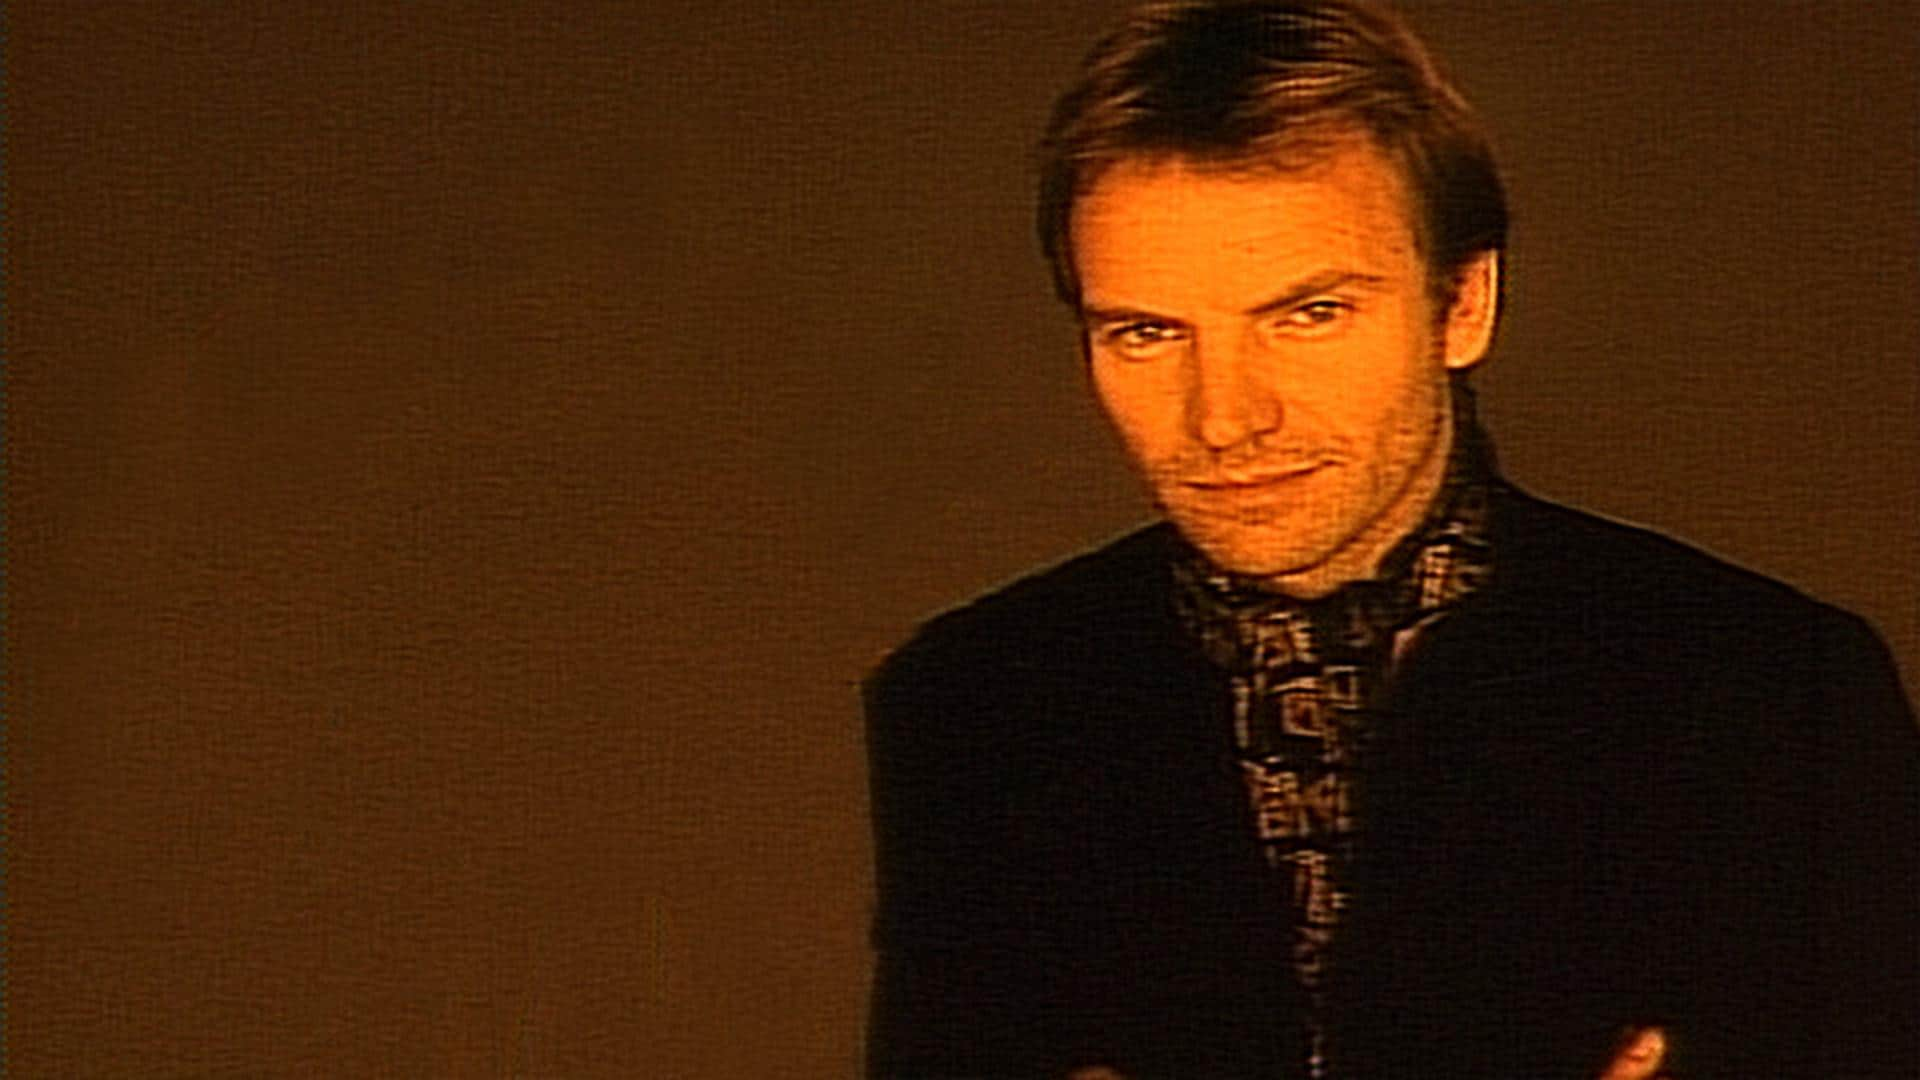 Sting: January 19, 1991